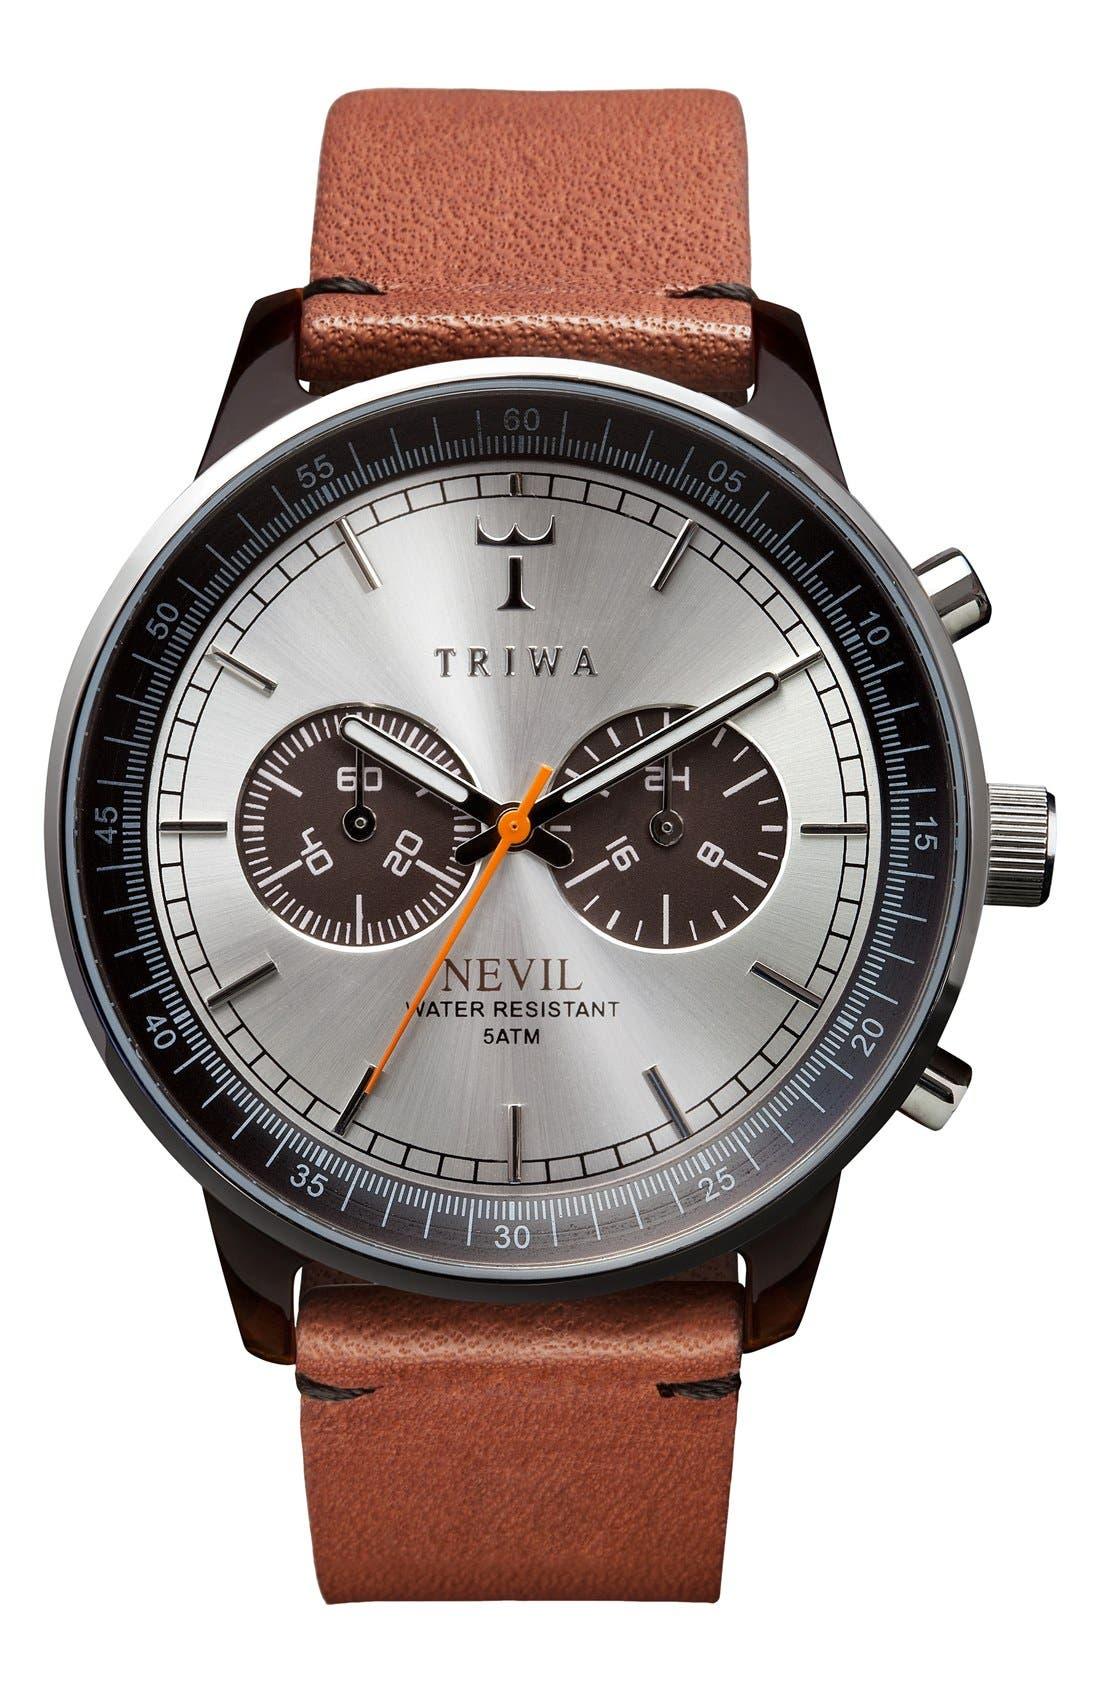 TRIWA HAVANA NEVIL CHRONOGRAPH LEATHER STRAP, 42MM